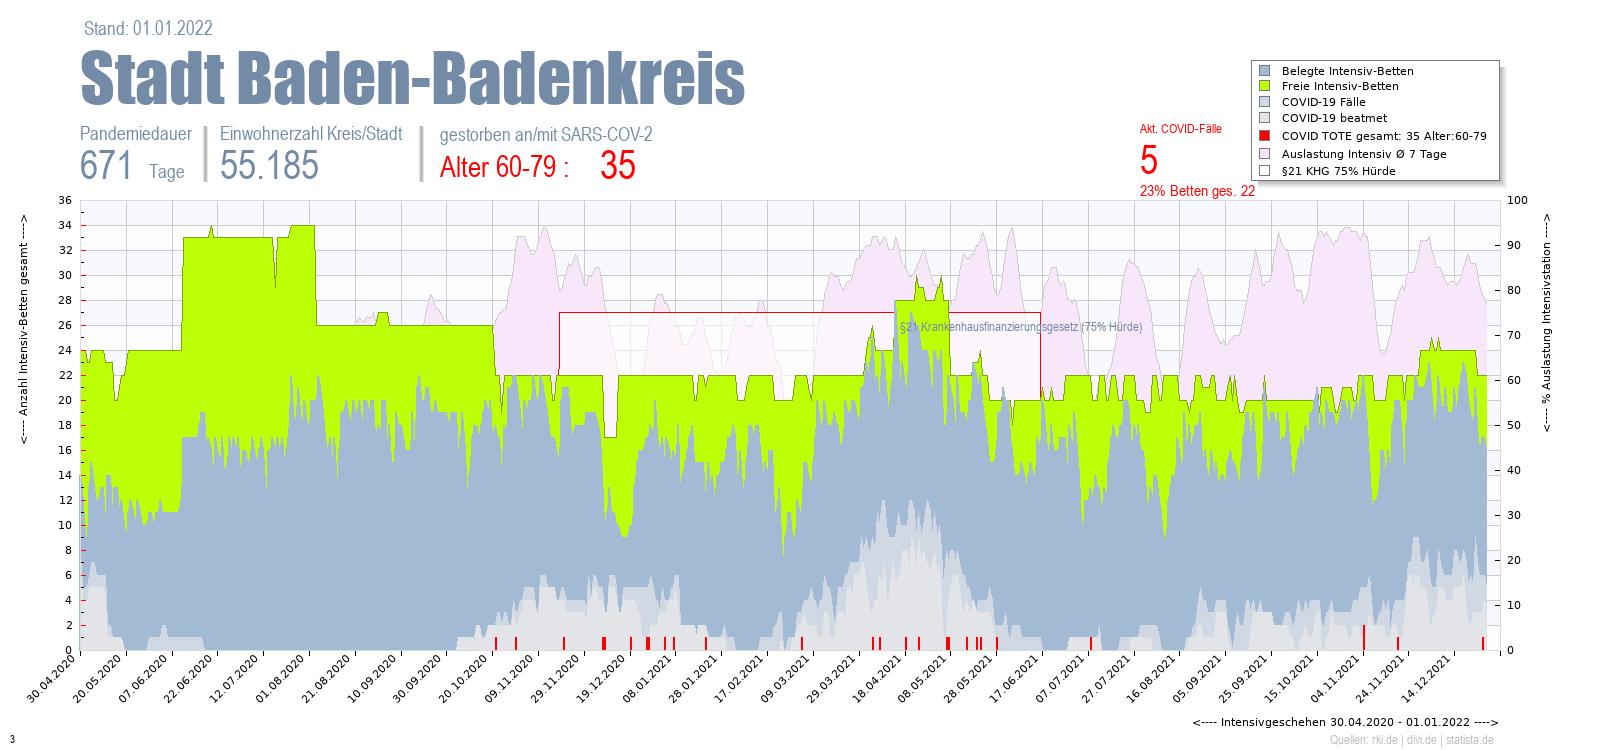 Intensivstation Auslastung Stadt Baden-Badenkreis Alter 0-4